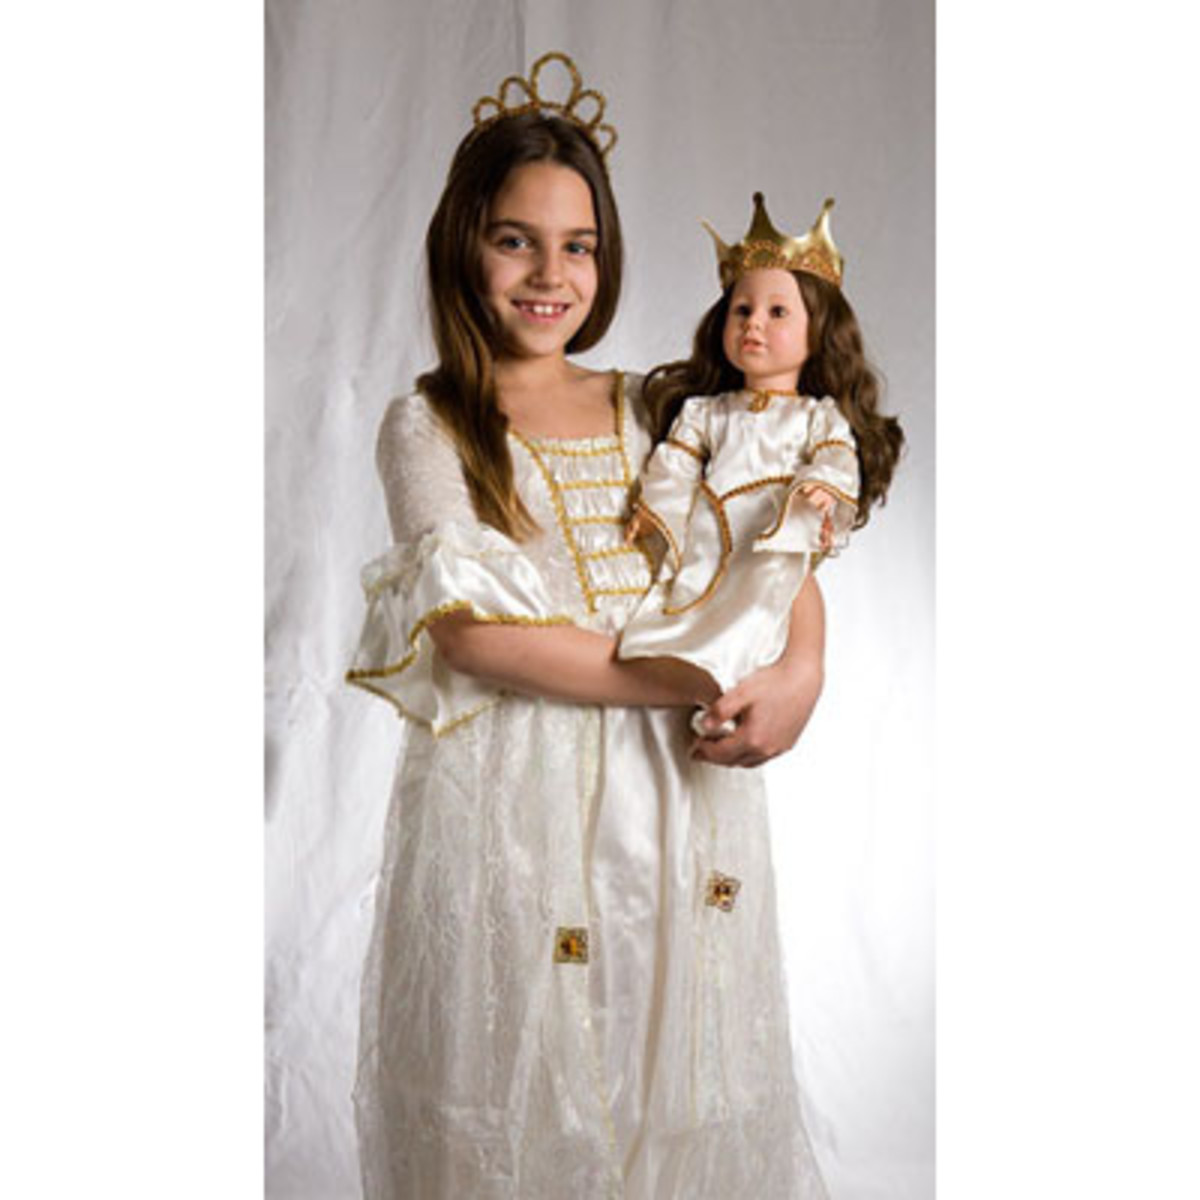 Photo from www.GaliGirls.com